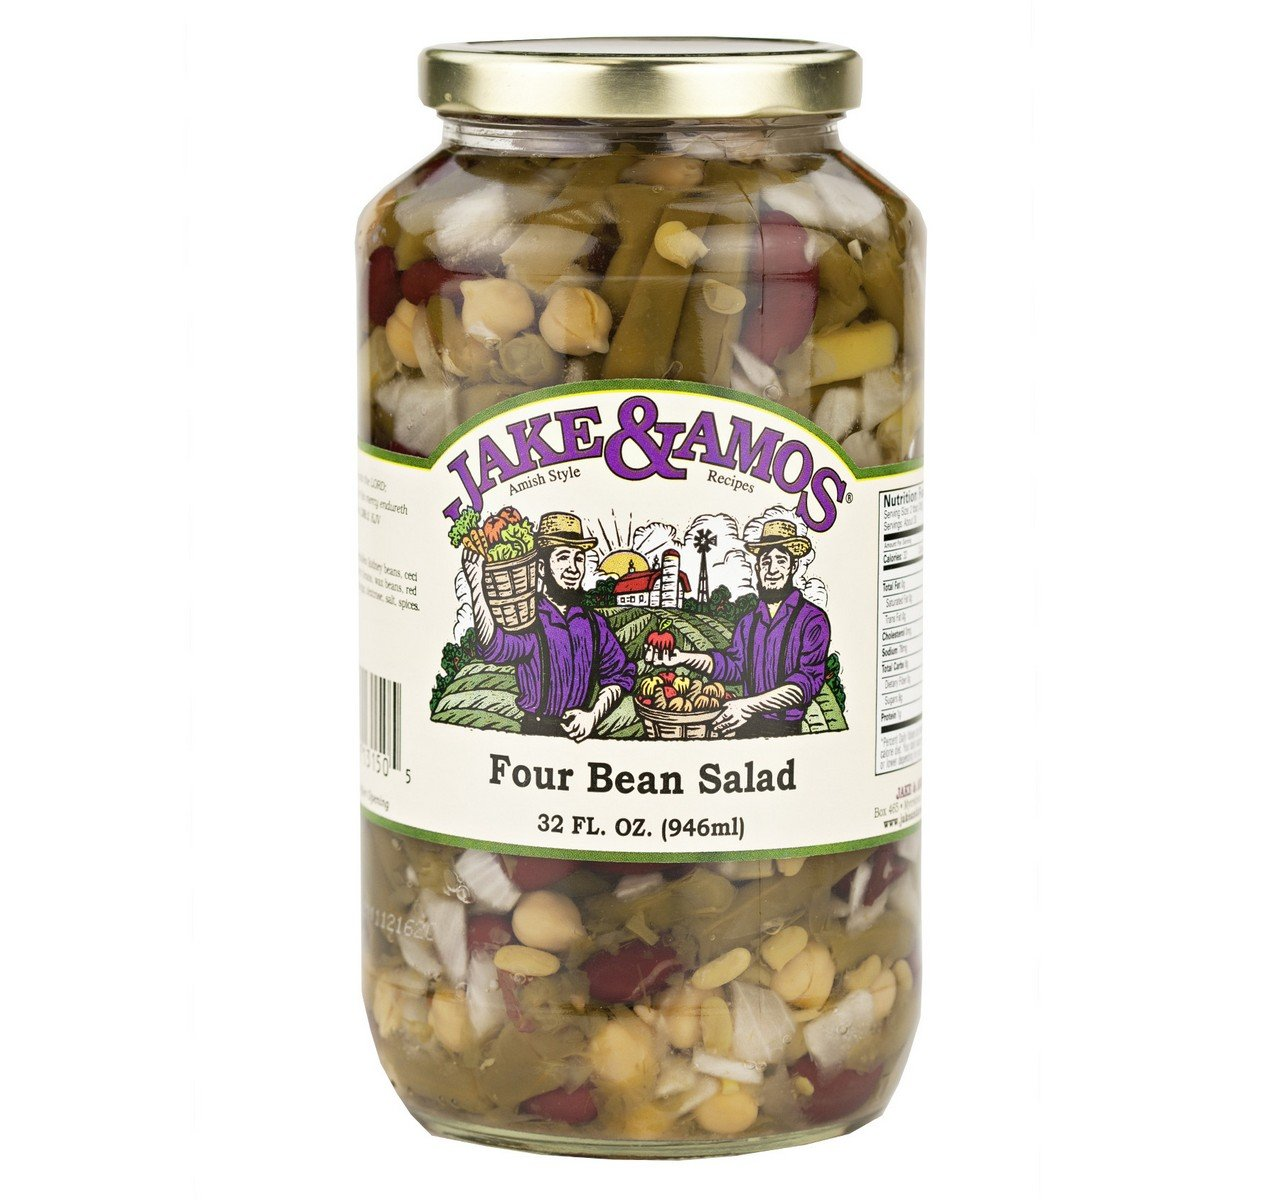 Jake & Amos Four Bean Salad, Pack of 2 (32 Oz. Jar)